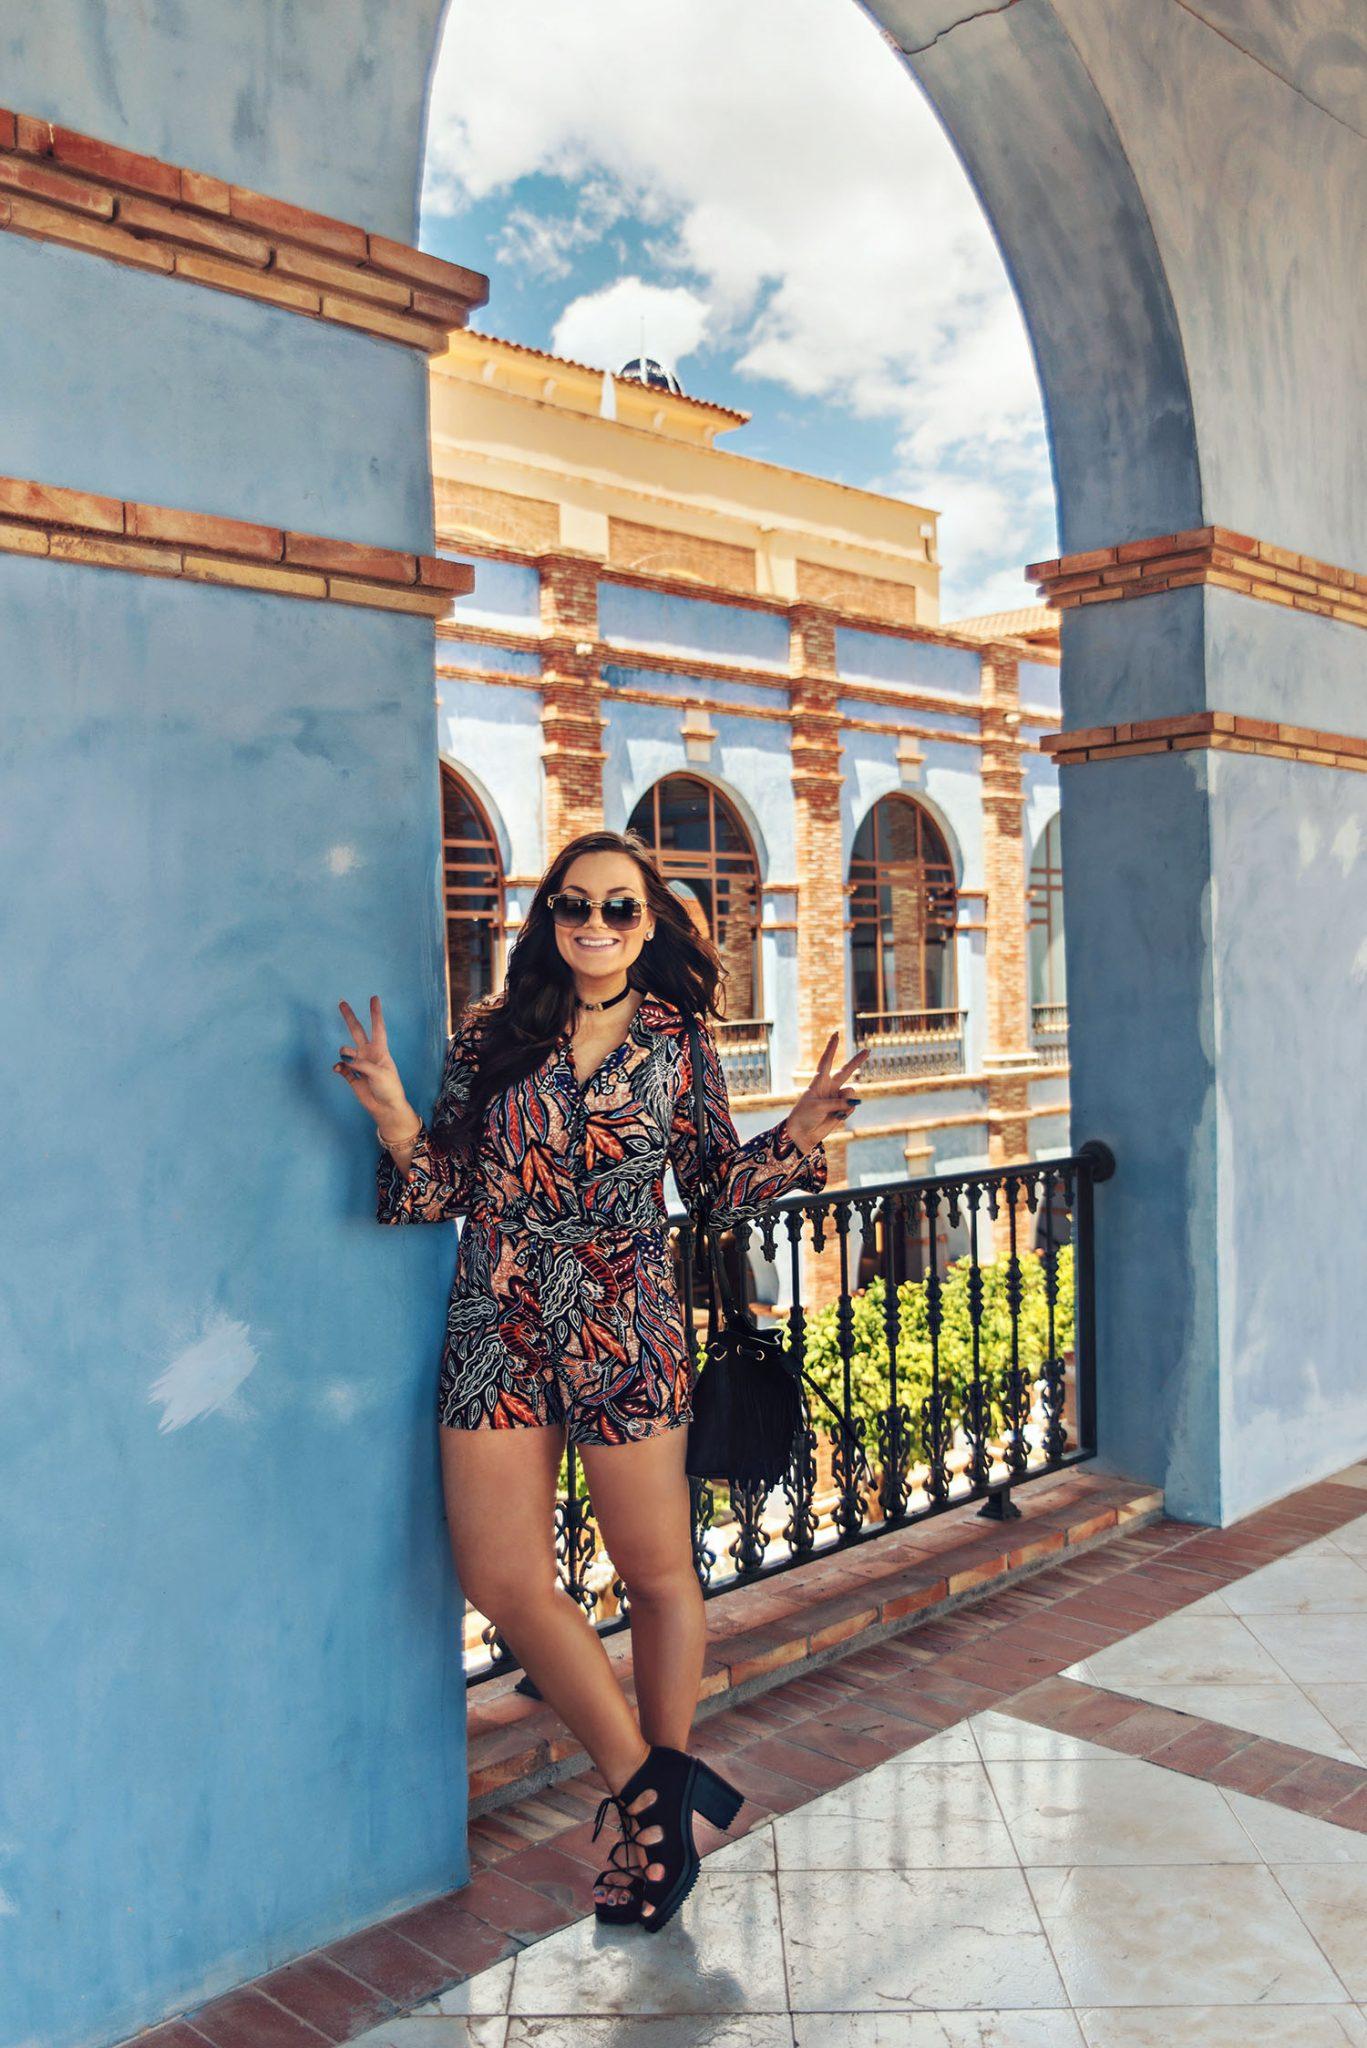 Melia Villaitana Hotel in Benidorm